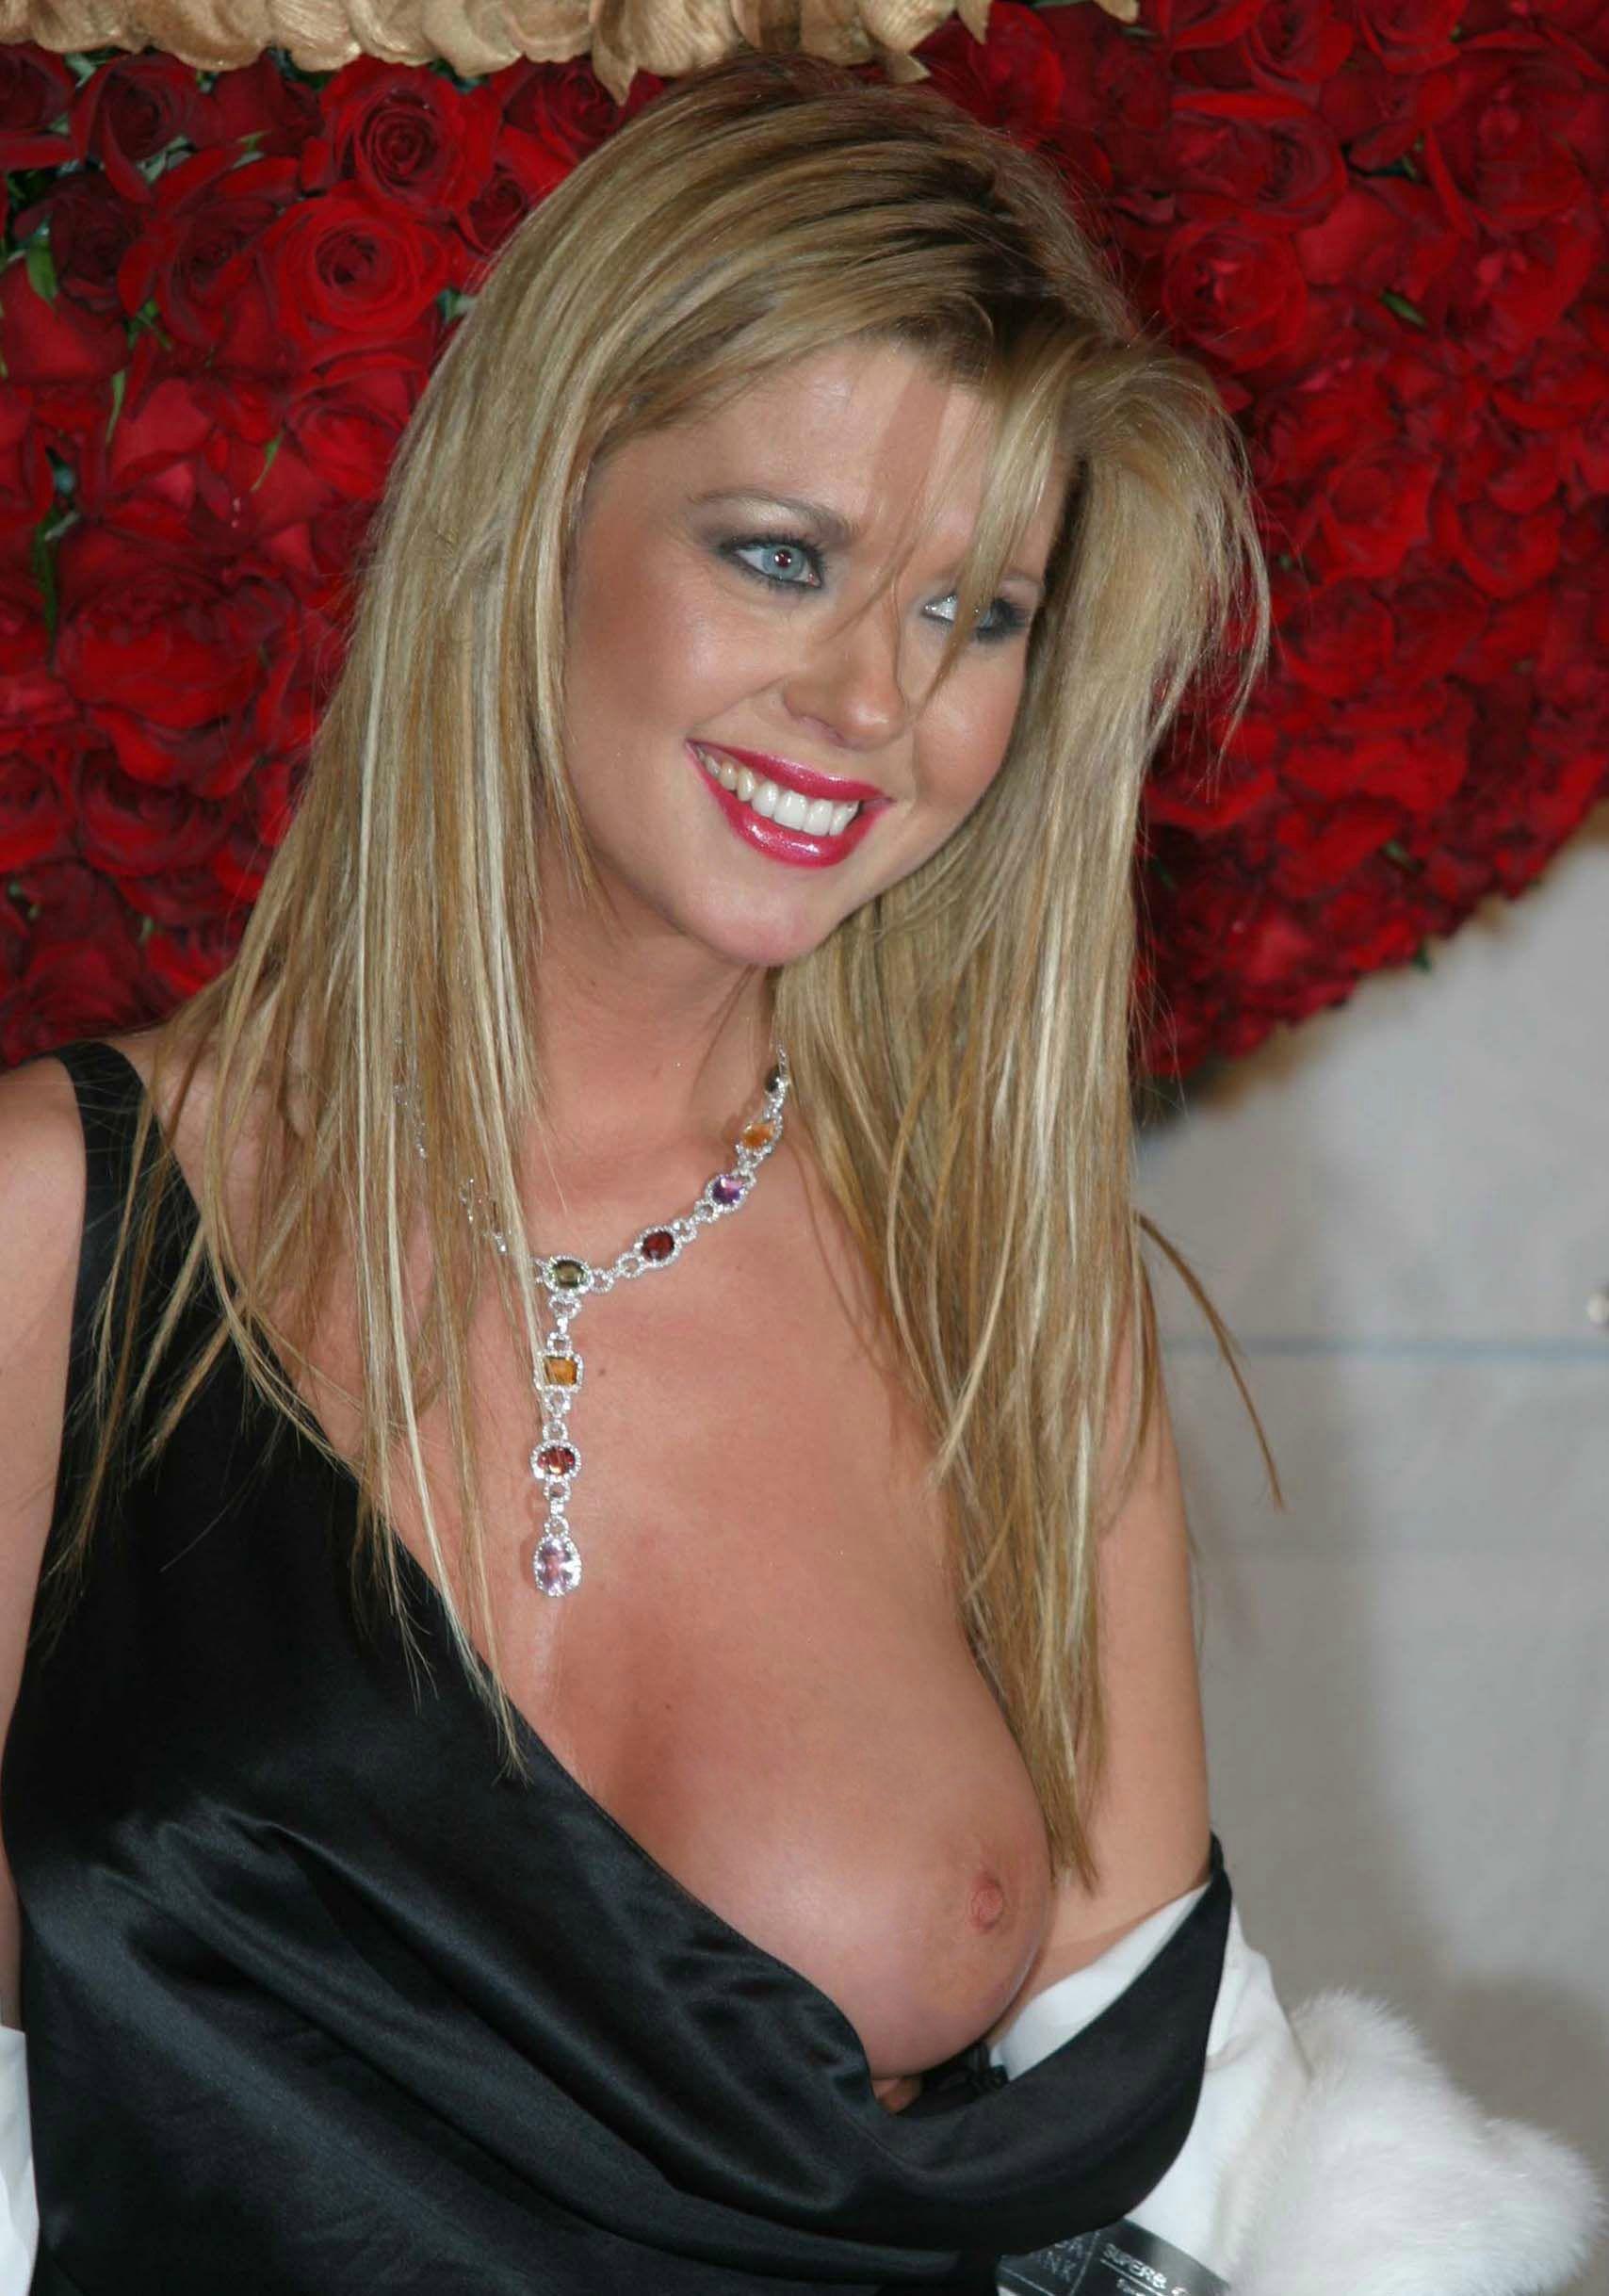 Tara reid red naked